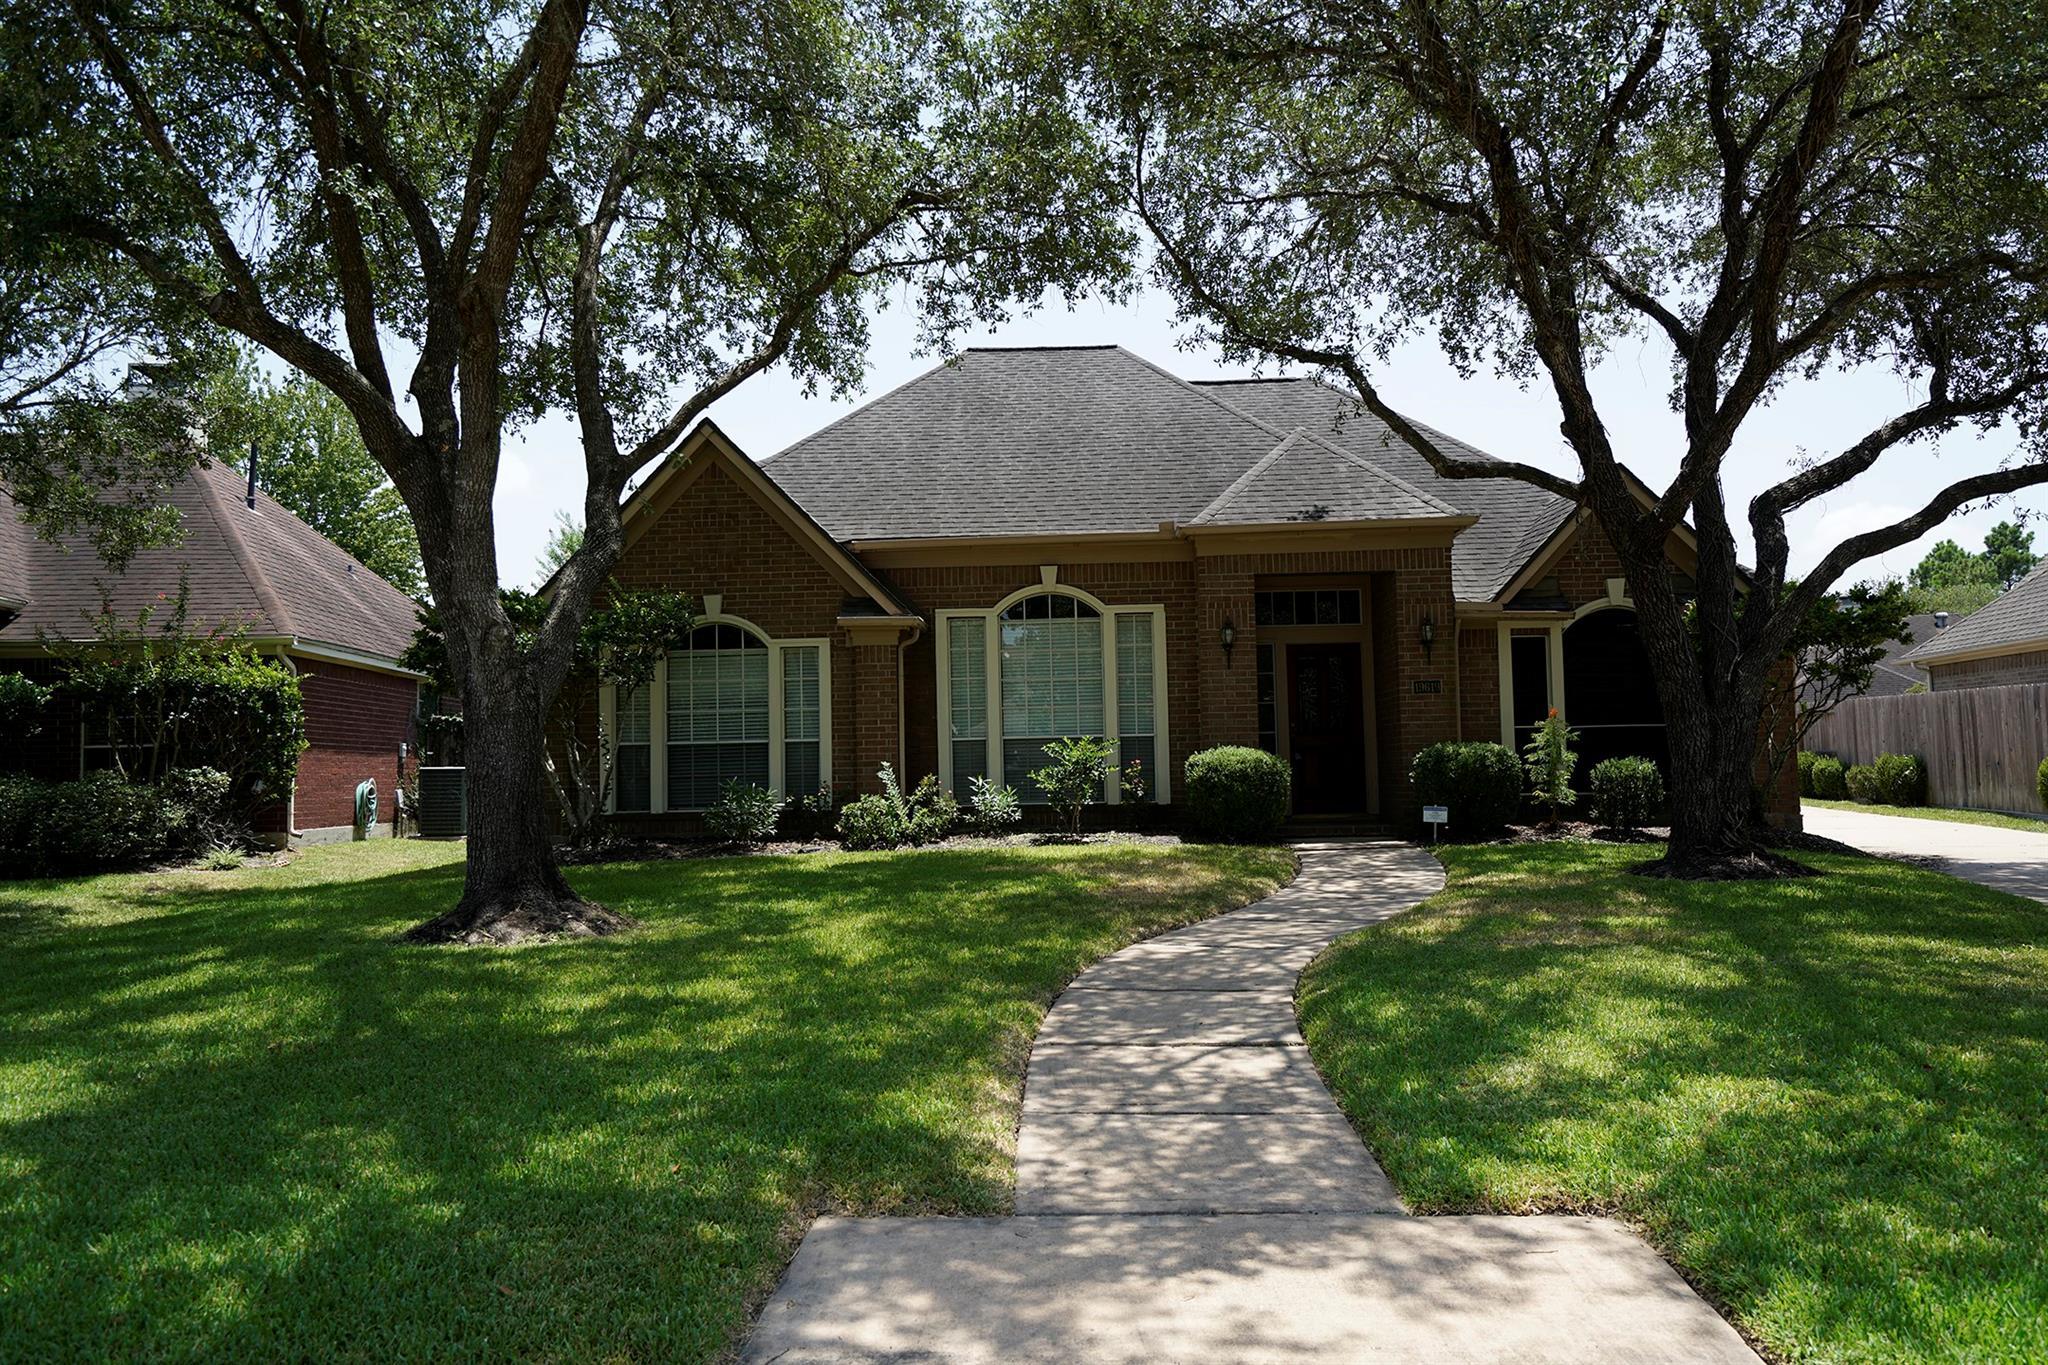 19619 Remington Crest Court Property Photo - Houston, TX real estate listing